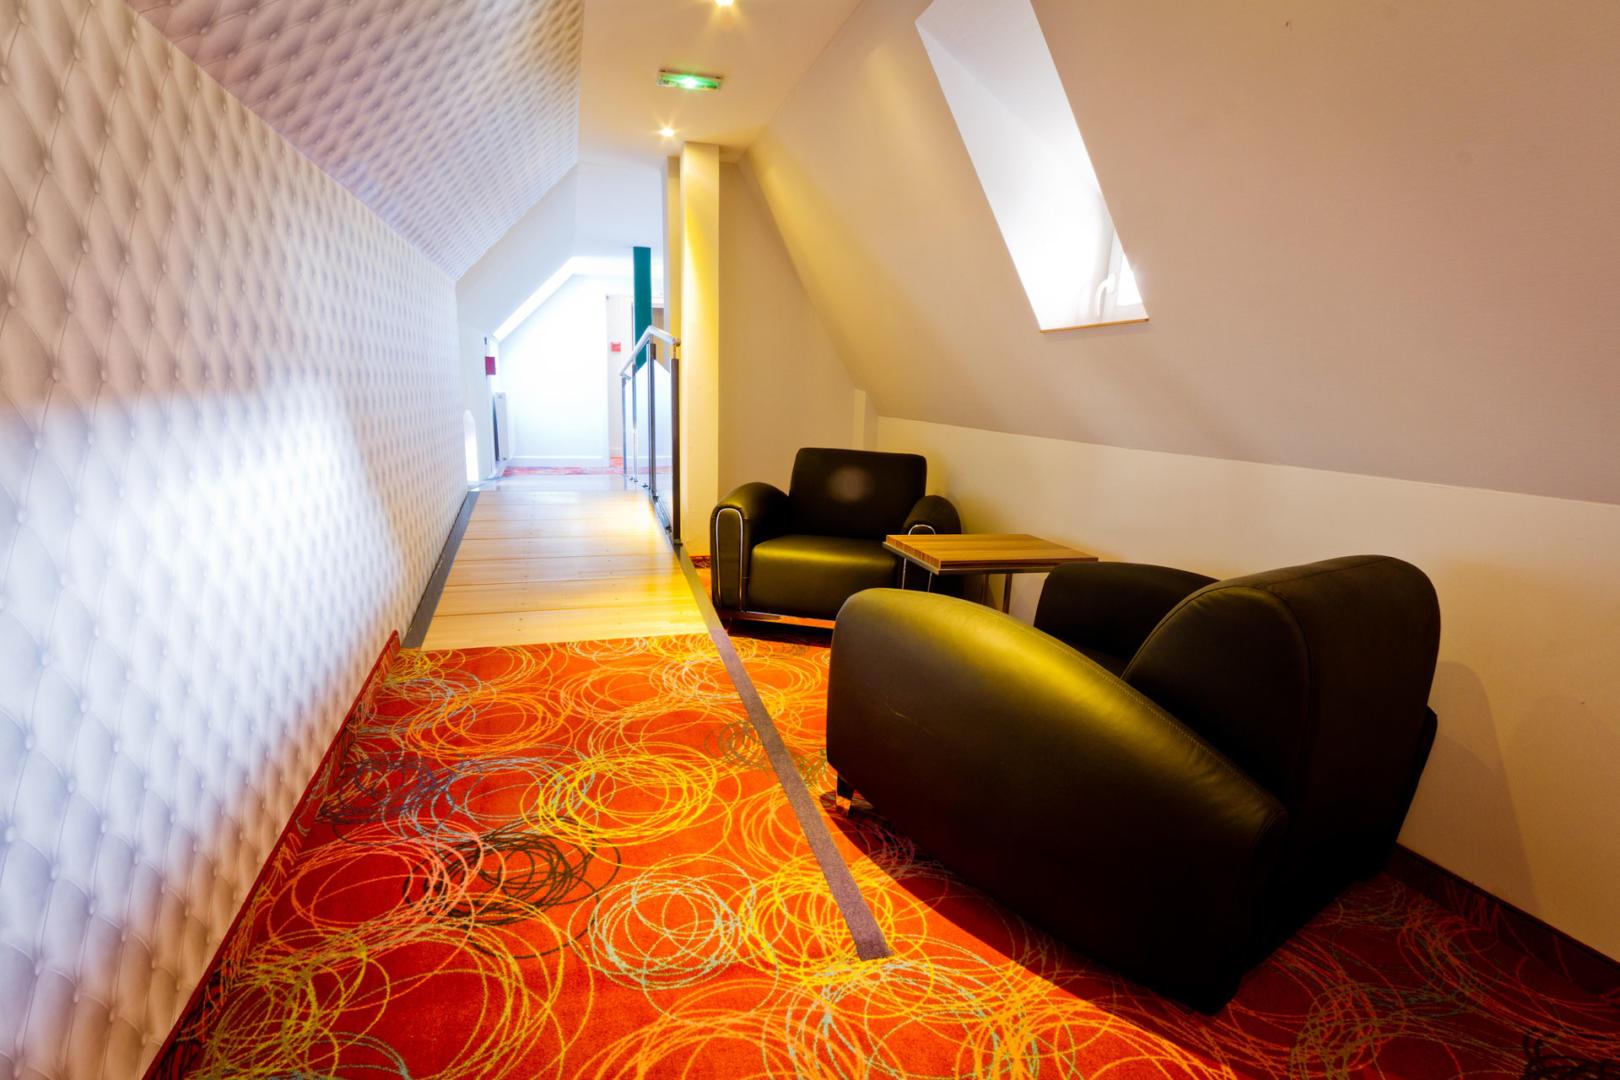 H tel design alsace saint louis h tel spa 4 la villa k for Designhotel elsass